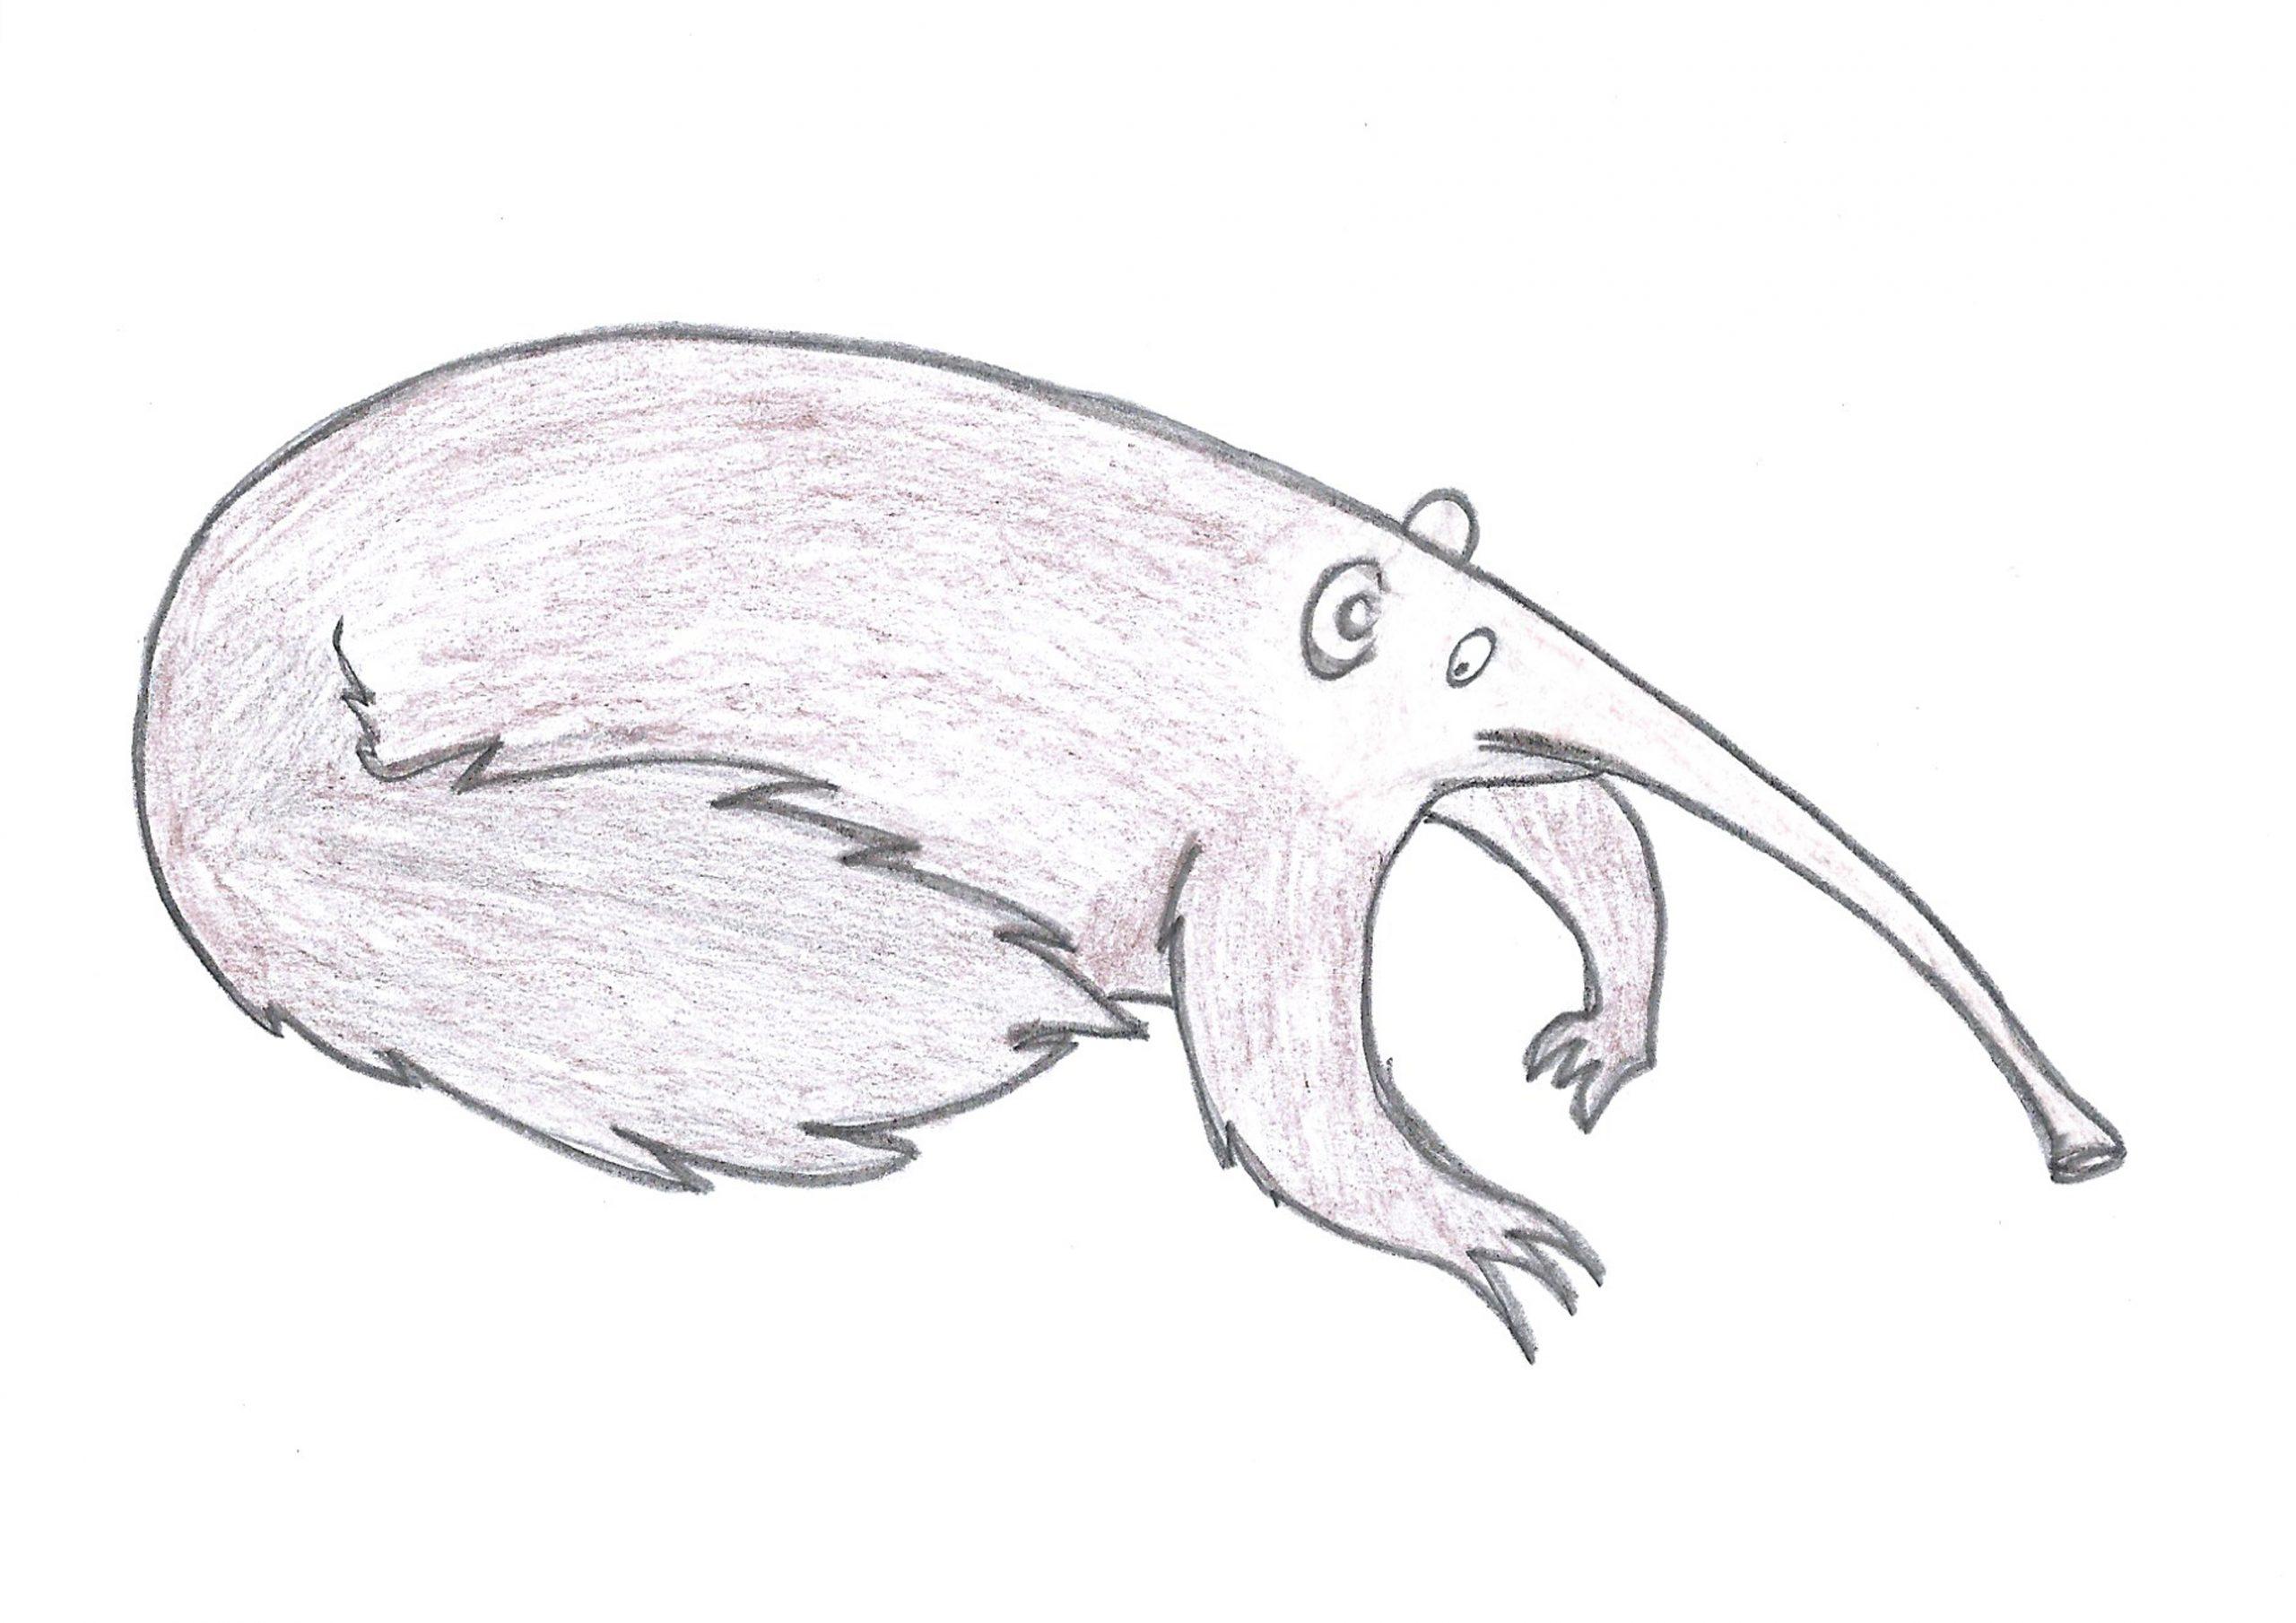 Jurumi — The Anteater